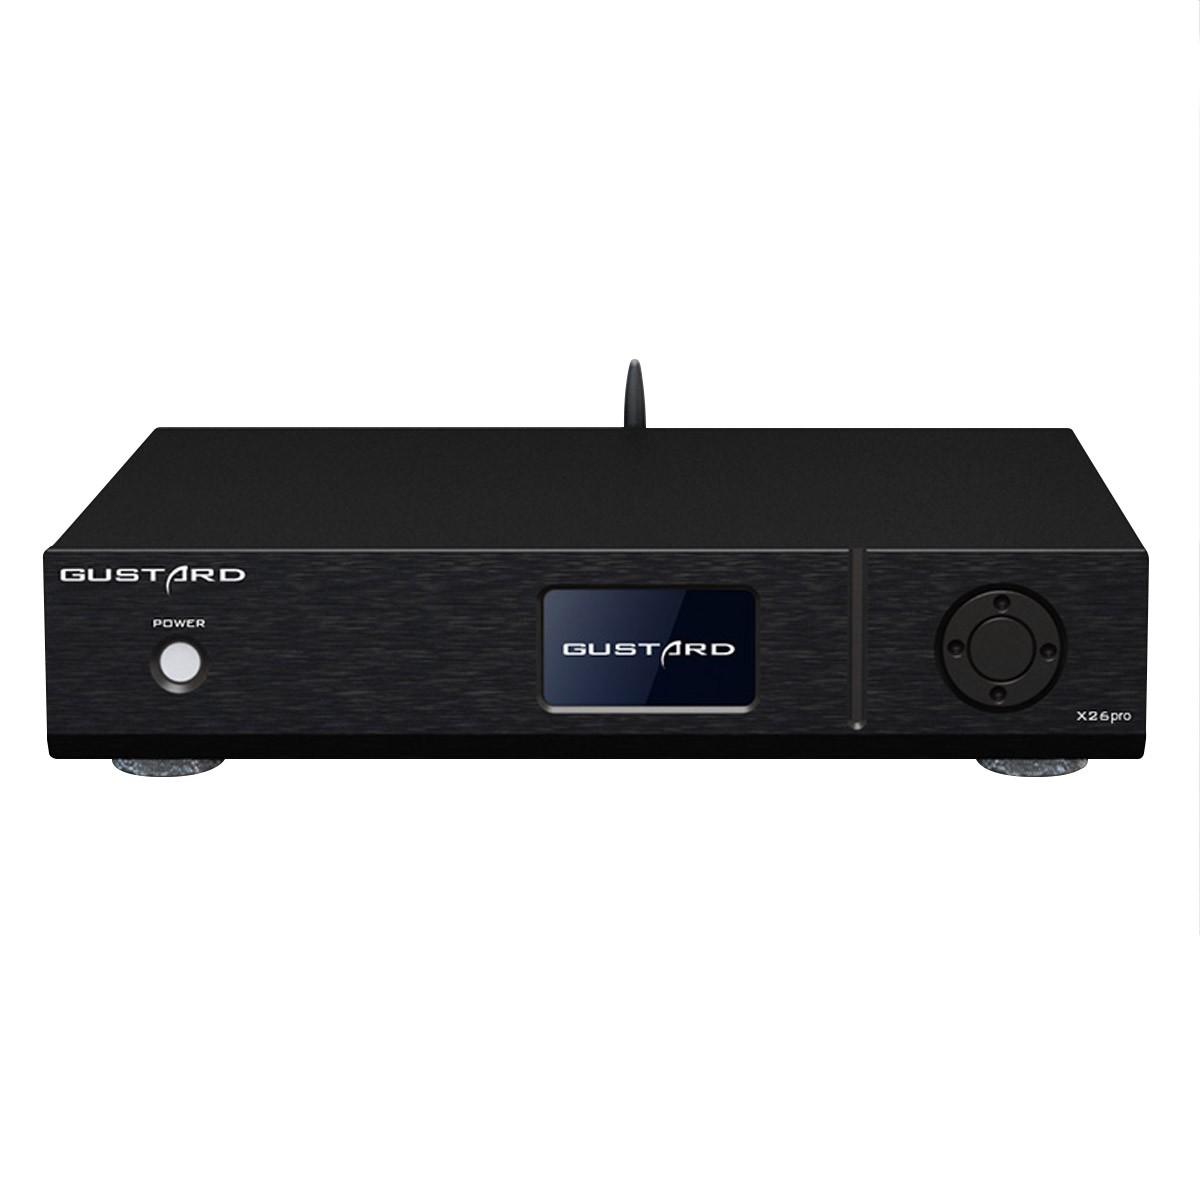 GUSTARD X26 PRO Balanced DAC 2x ES9038Pro XMOS Bluetooth 5.0 MQA 32Bit 768kHz DSD512 Black